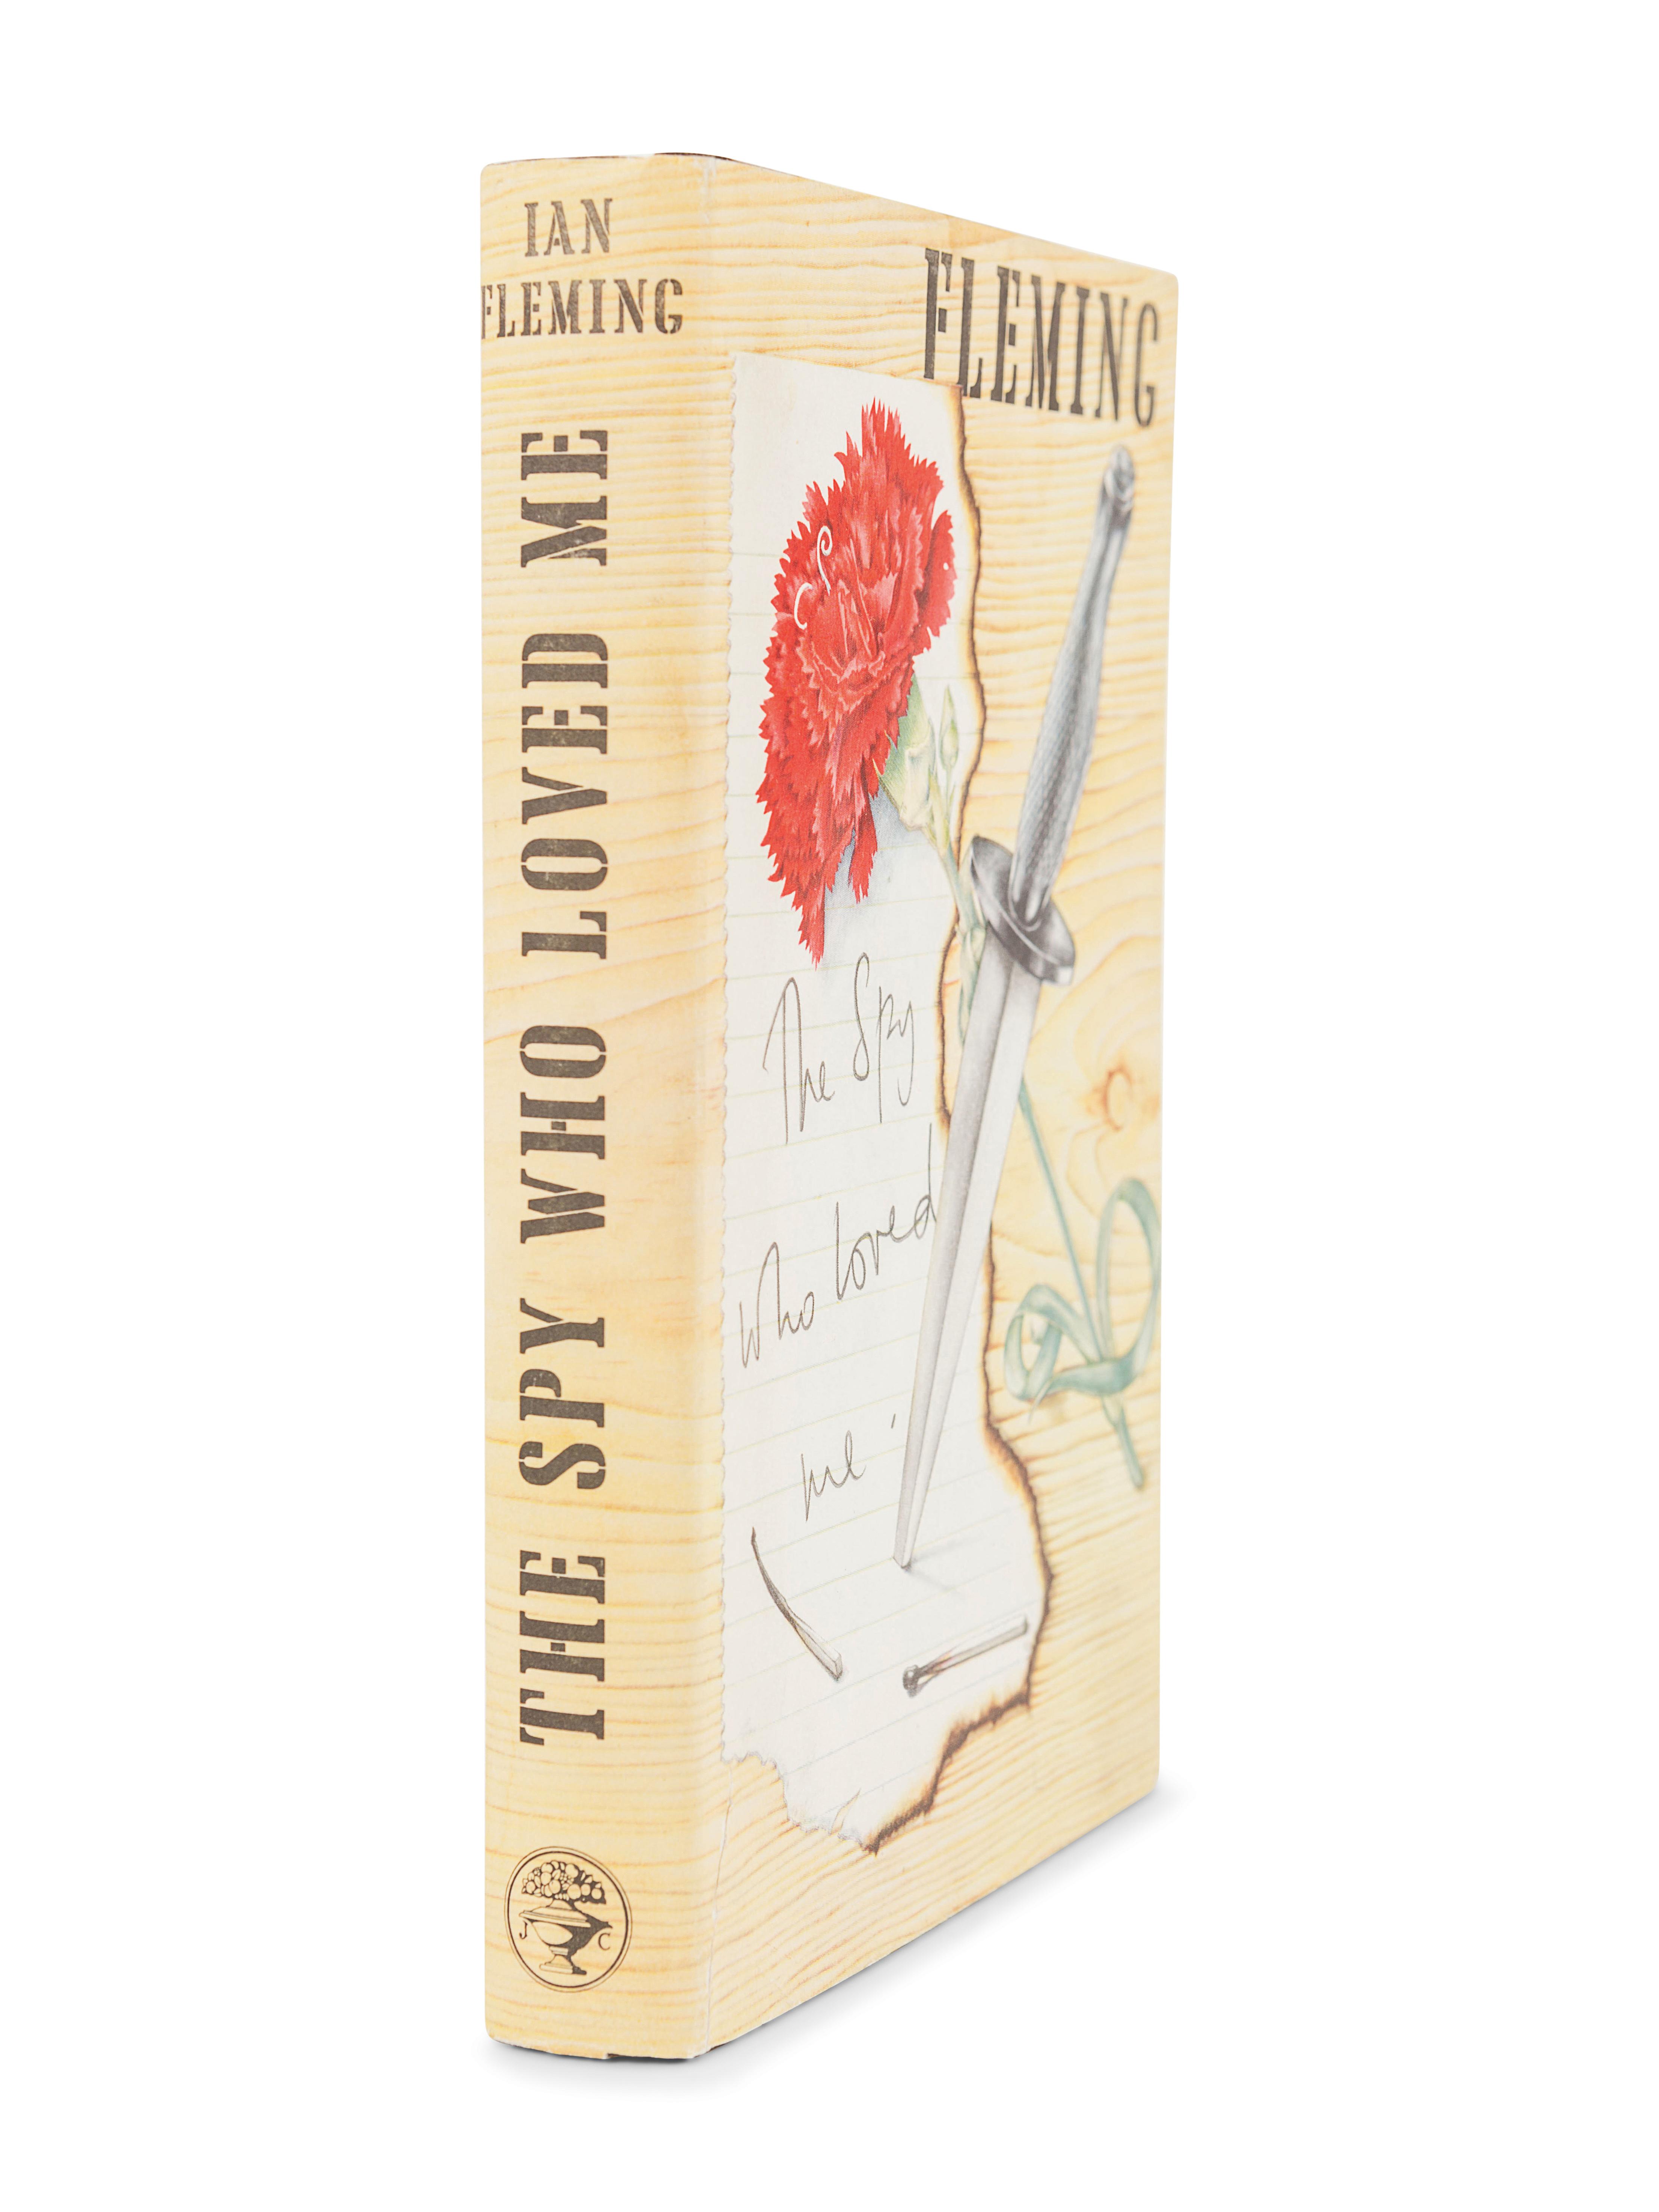 FLEMING, Ian (1908-1964). The Spy Who Loved Me. London: Jonathan Cape, 1962. - Image 2 of 3